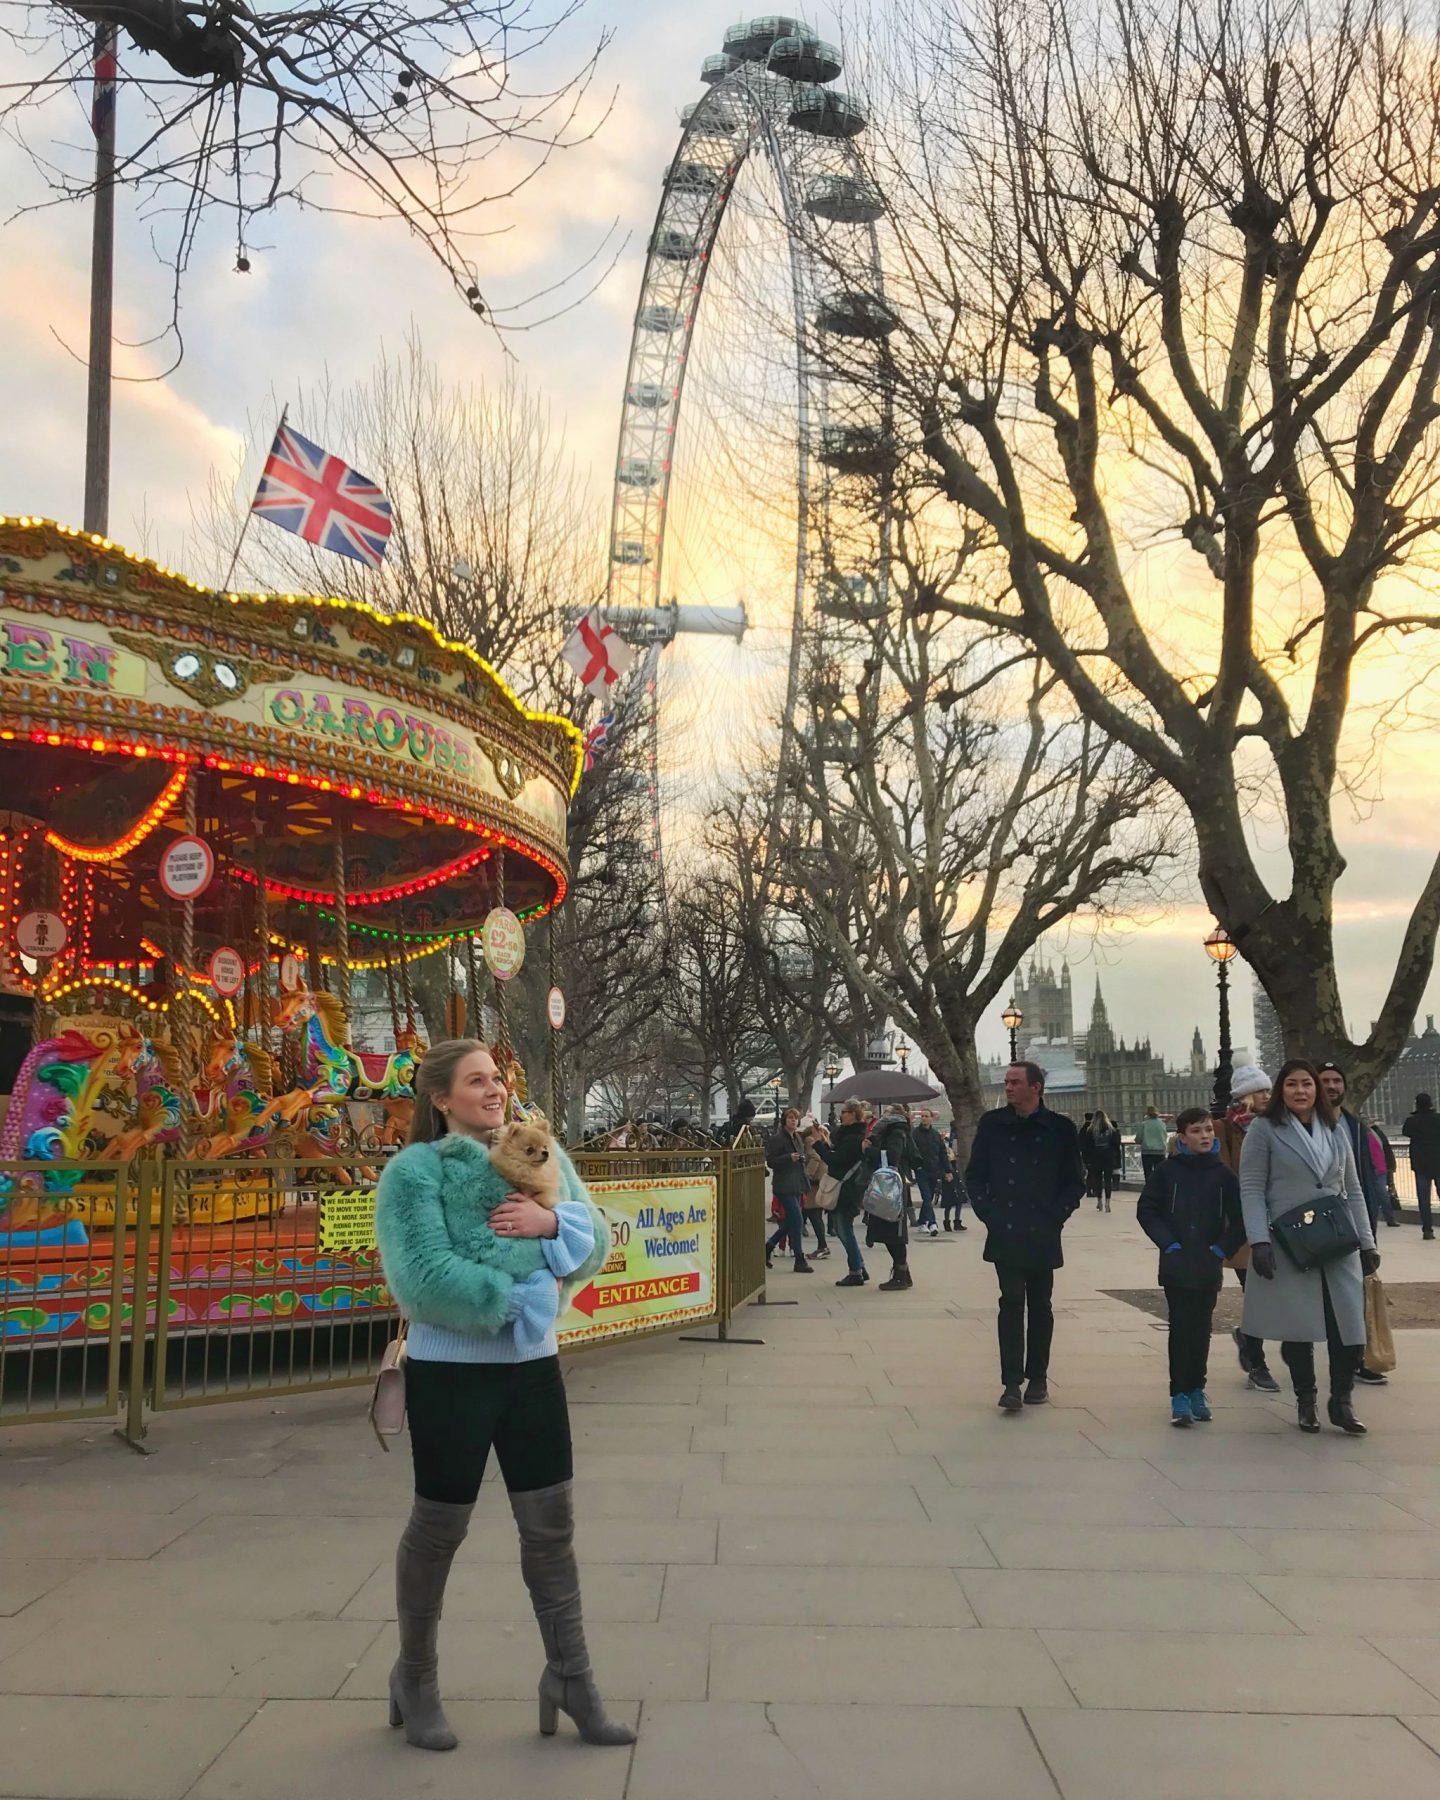 Katie Heath, KALANCHOE, Instagram photo in London